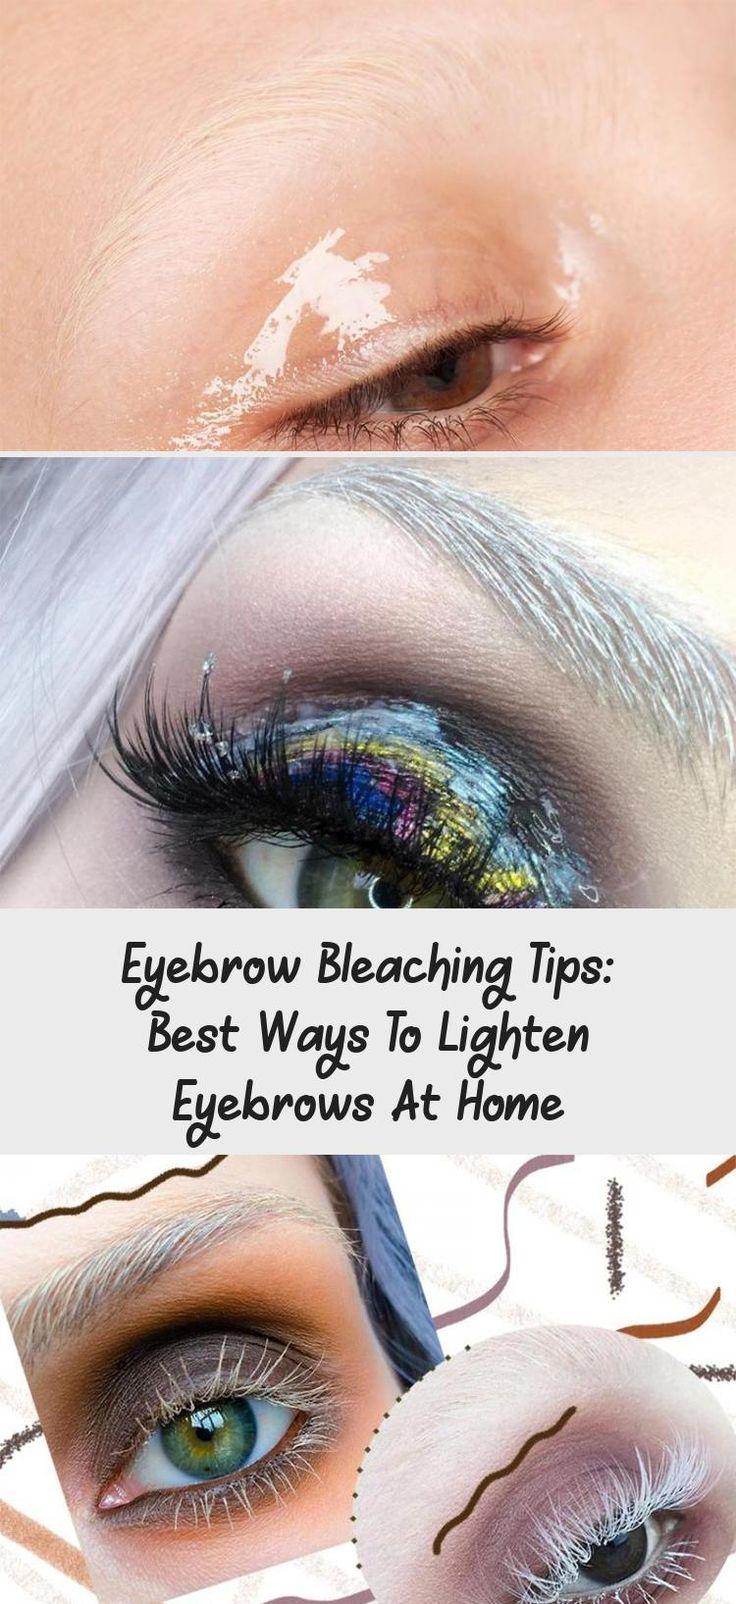 Eyebrow bleaching tips best ways to lighten eyebrows at